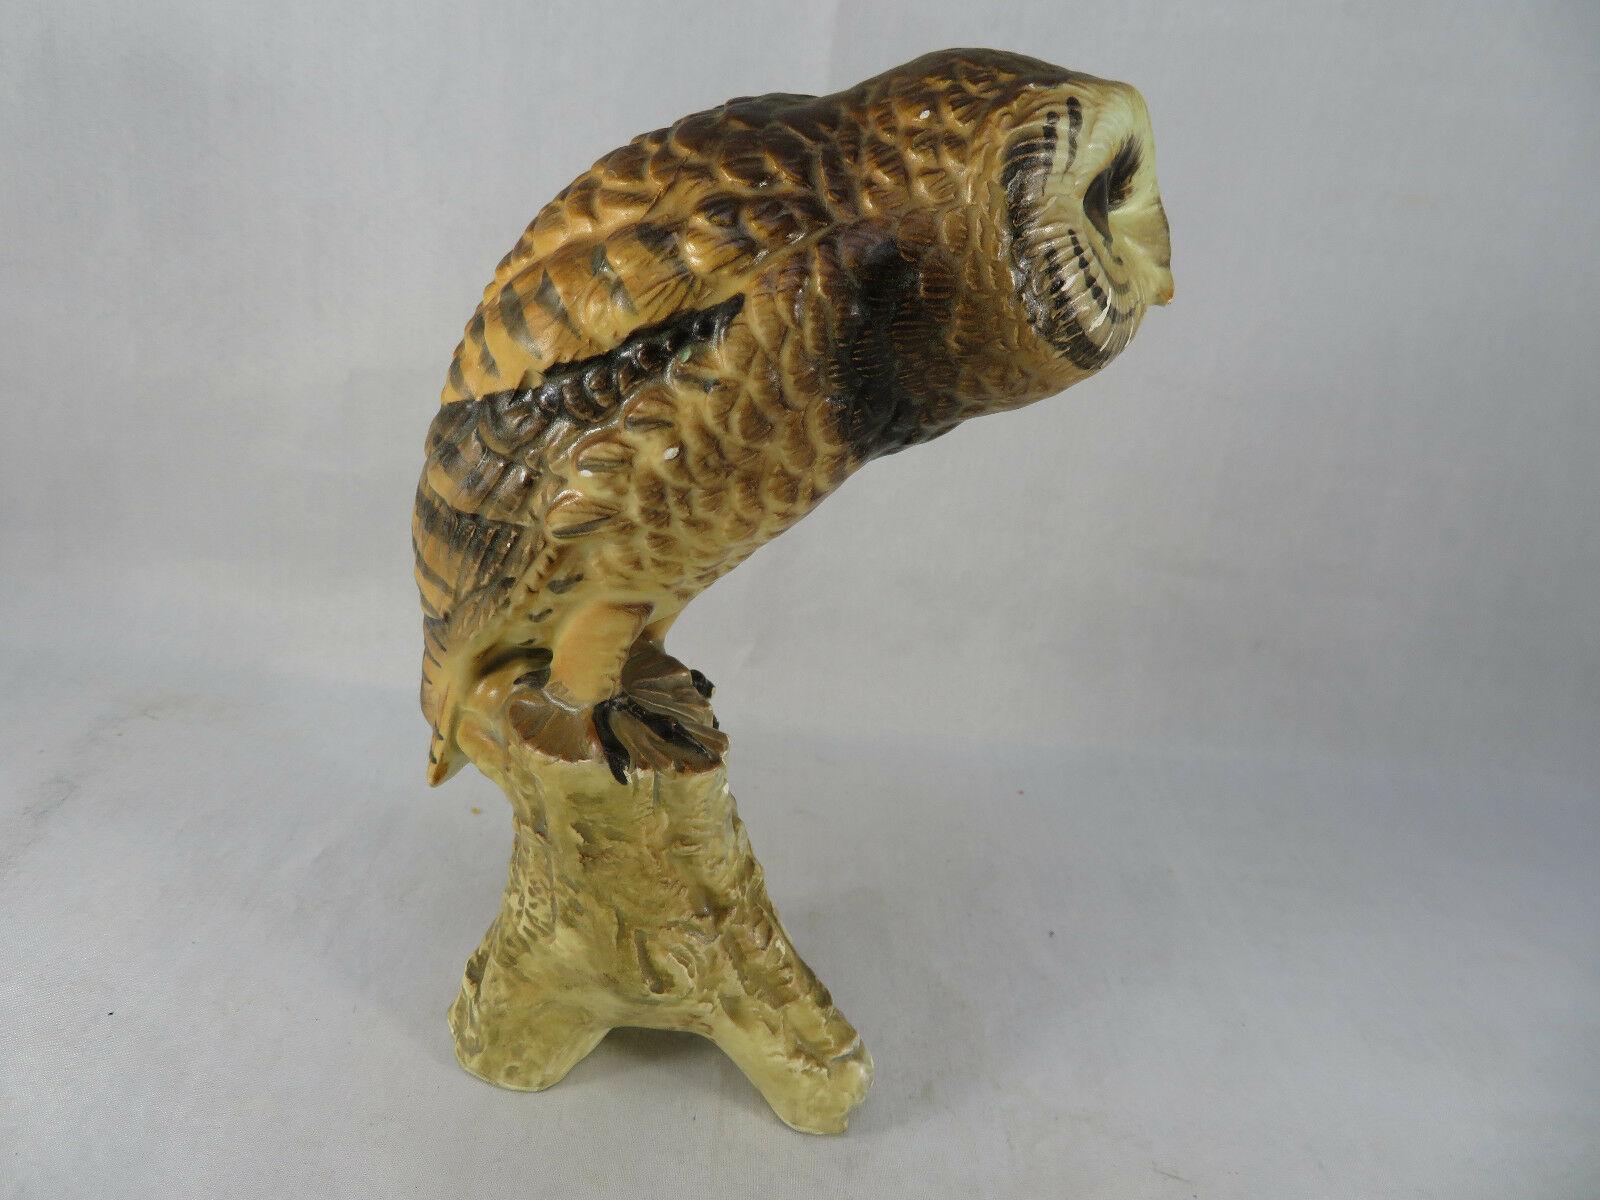 "Vintage BARN OWL Figurine Bird Ceramic Model Hand Painted JAPAN 6""1/2 Tall"